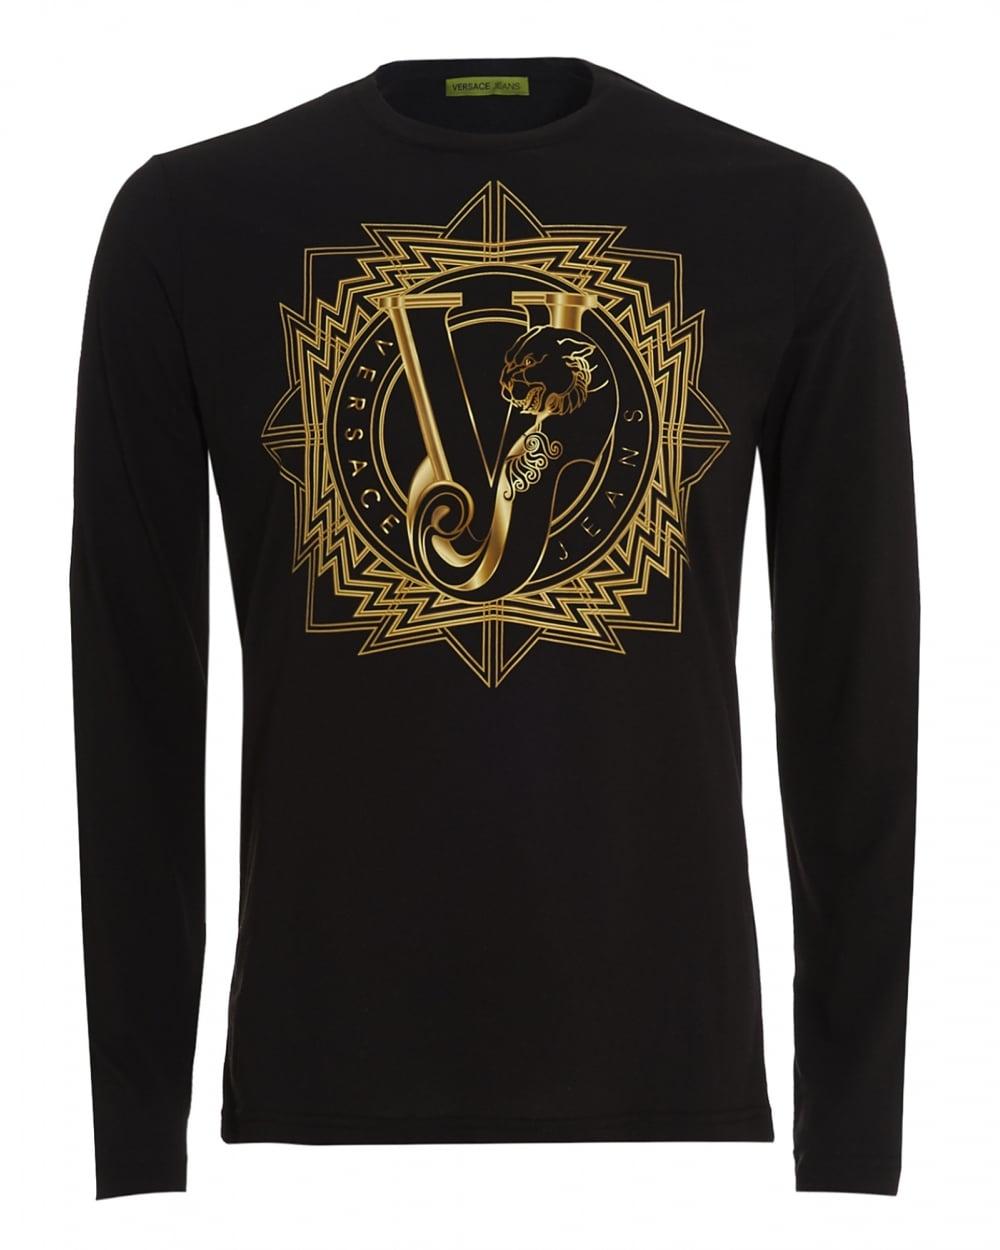 270ce7b3f45bc Versace Jeans Mens Long Sleeve T-Shirt Black Tiger VJ Logo Slim Fit